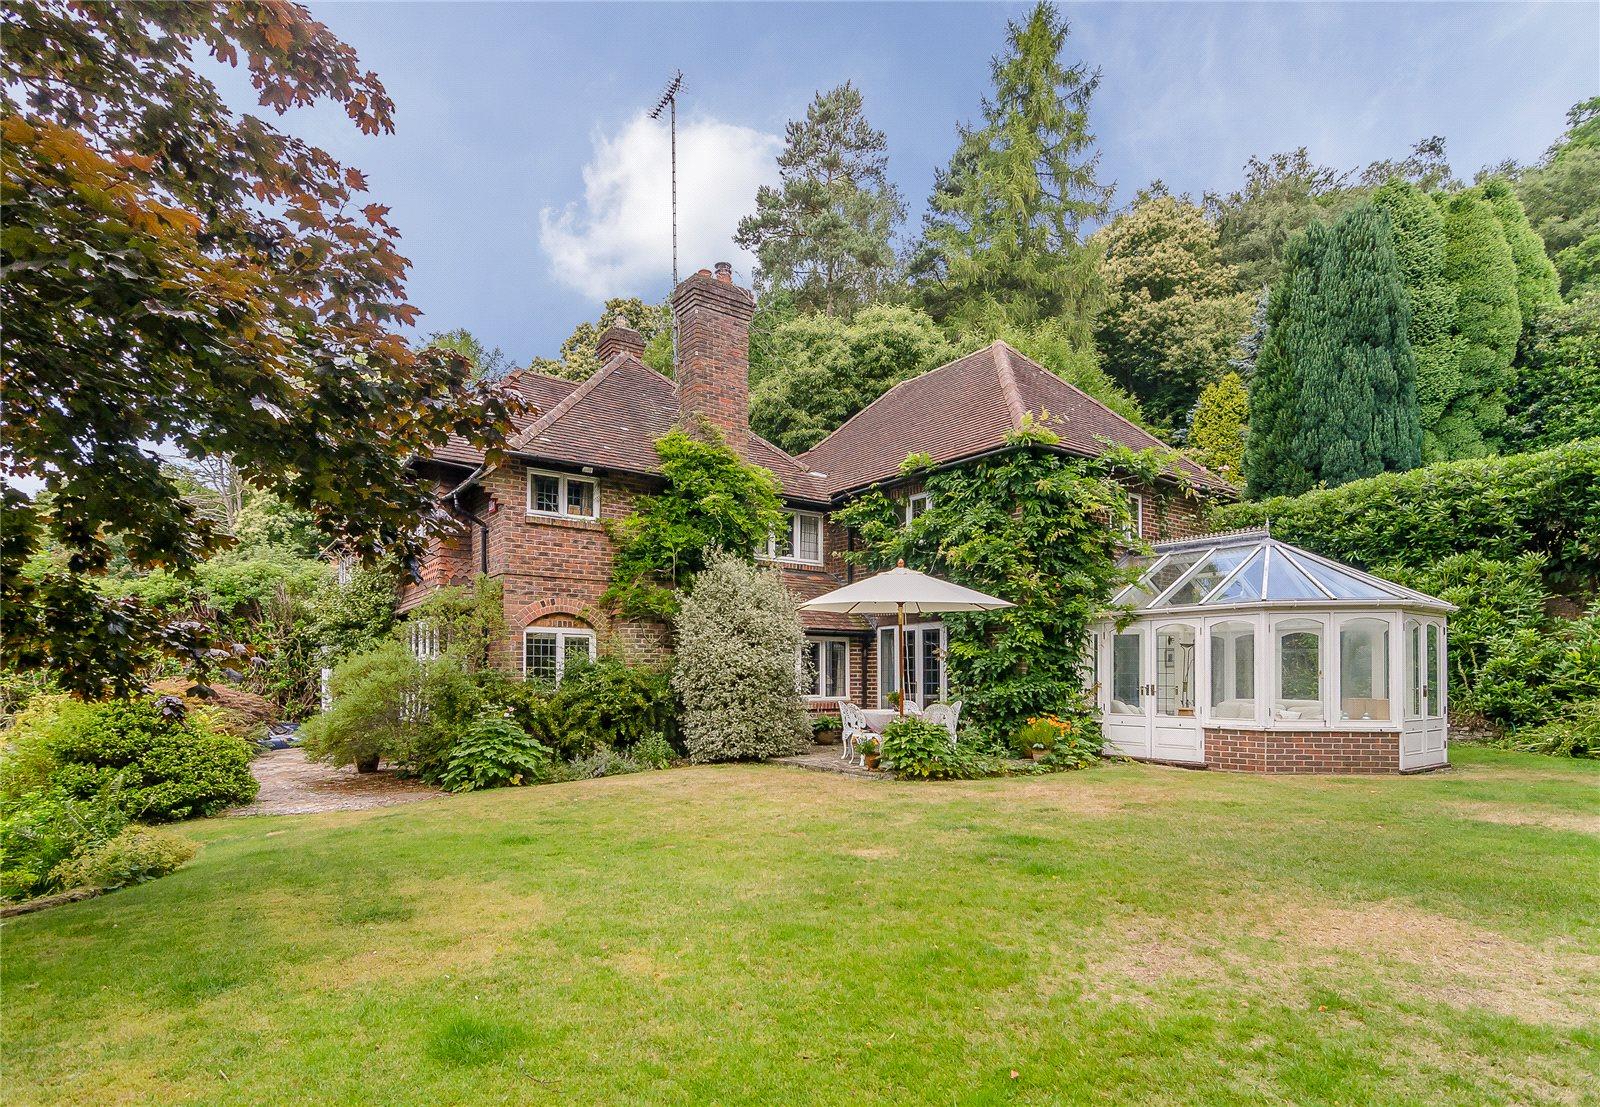 Villa per Vendita alle ore Chase Lane, Haslemere, Surrey, GU27 Haslemere, Inghilterra